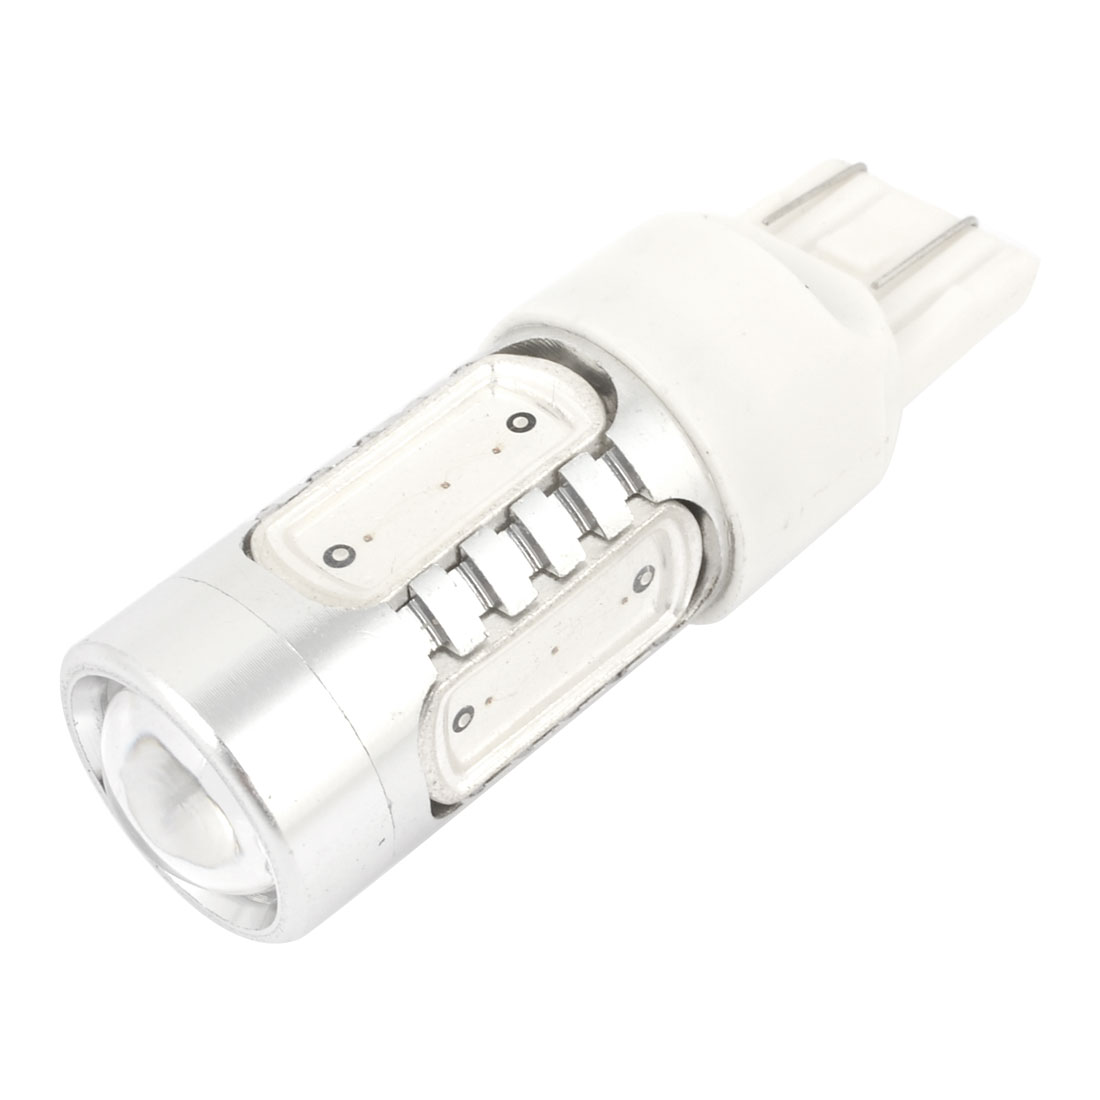 11W 5 LED 7440 7443 T20 Bulb Signal Stop Brake Tail Light Yellow